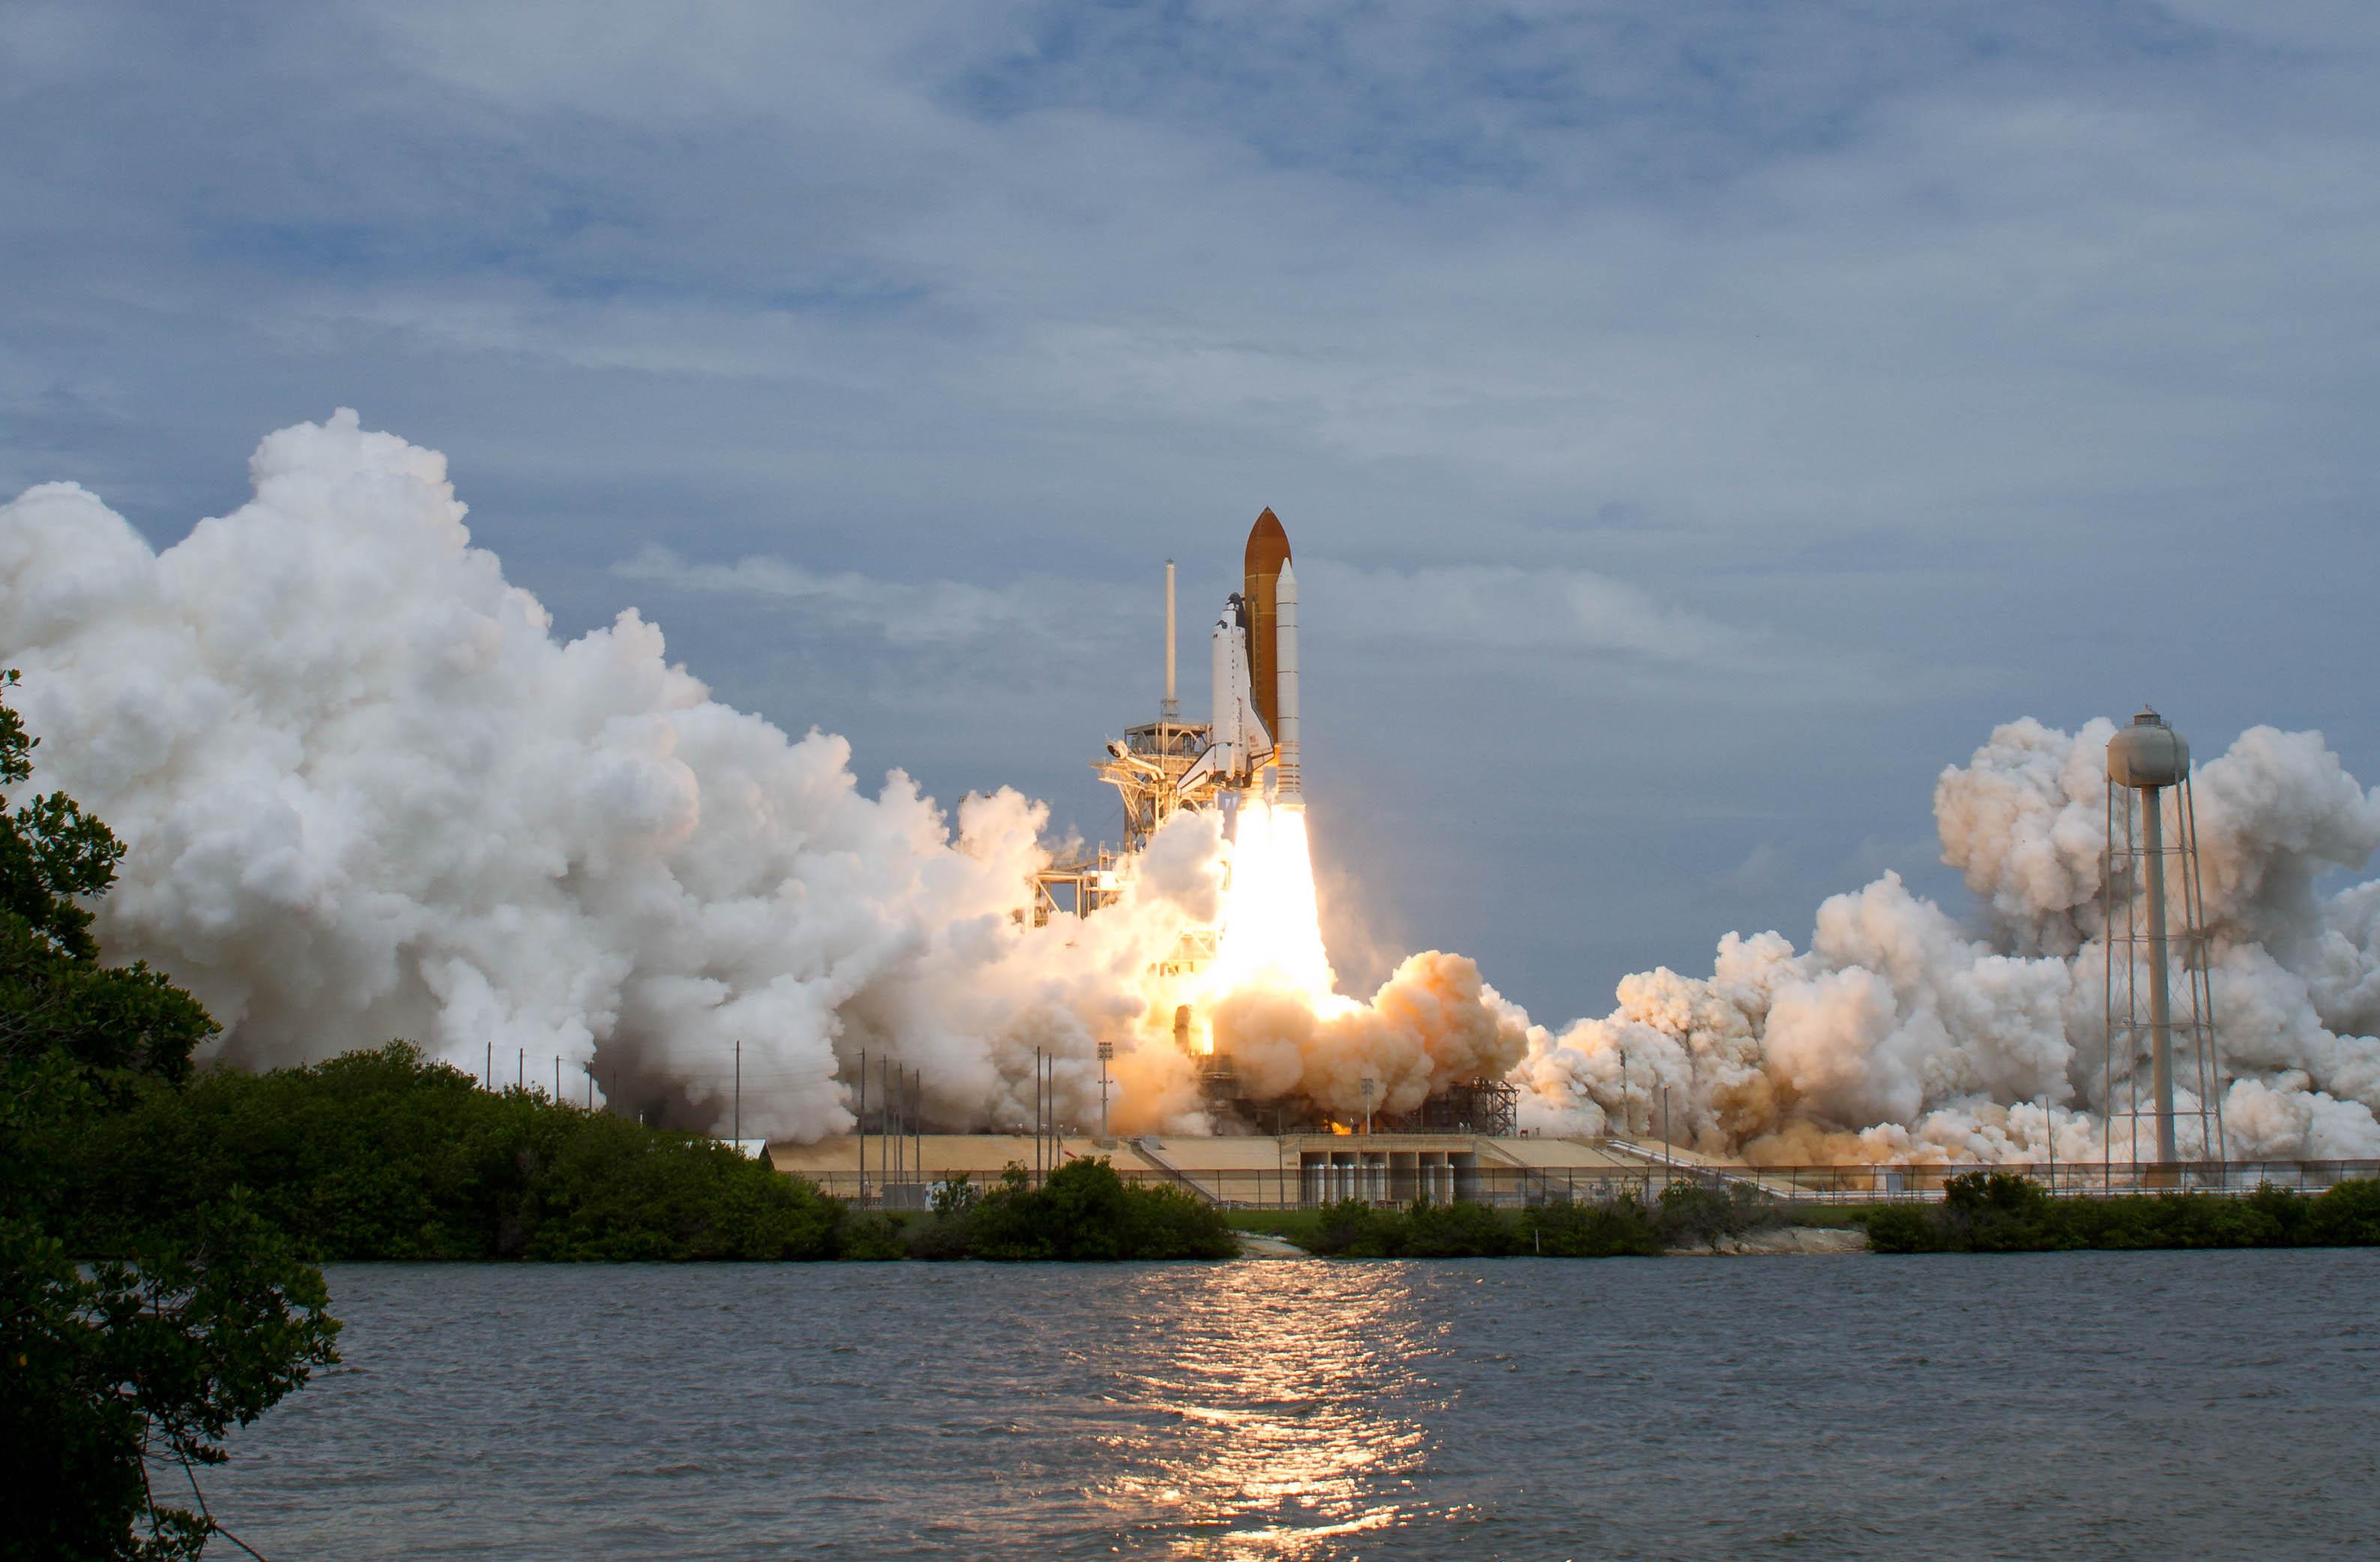 space shuttle program successor - photo #9